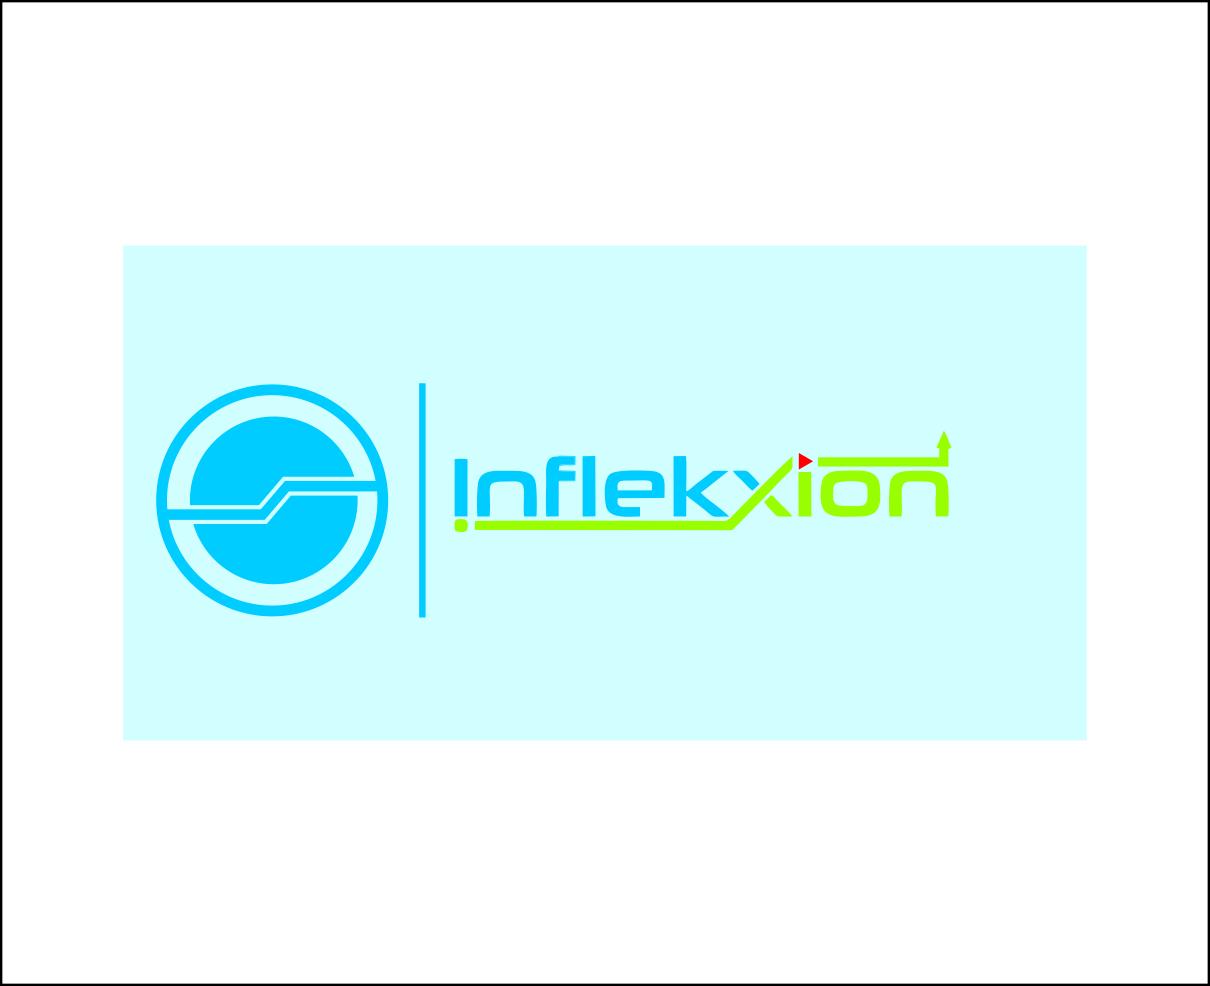 Logo Design by Agus Martoyo - Entry No. 203 in the Logo Design Contest Professional Logo Design for Inflekxion.